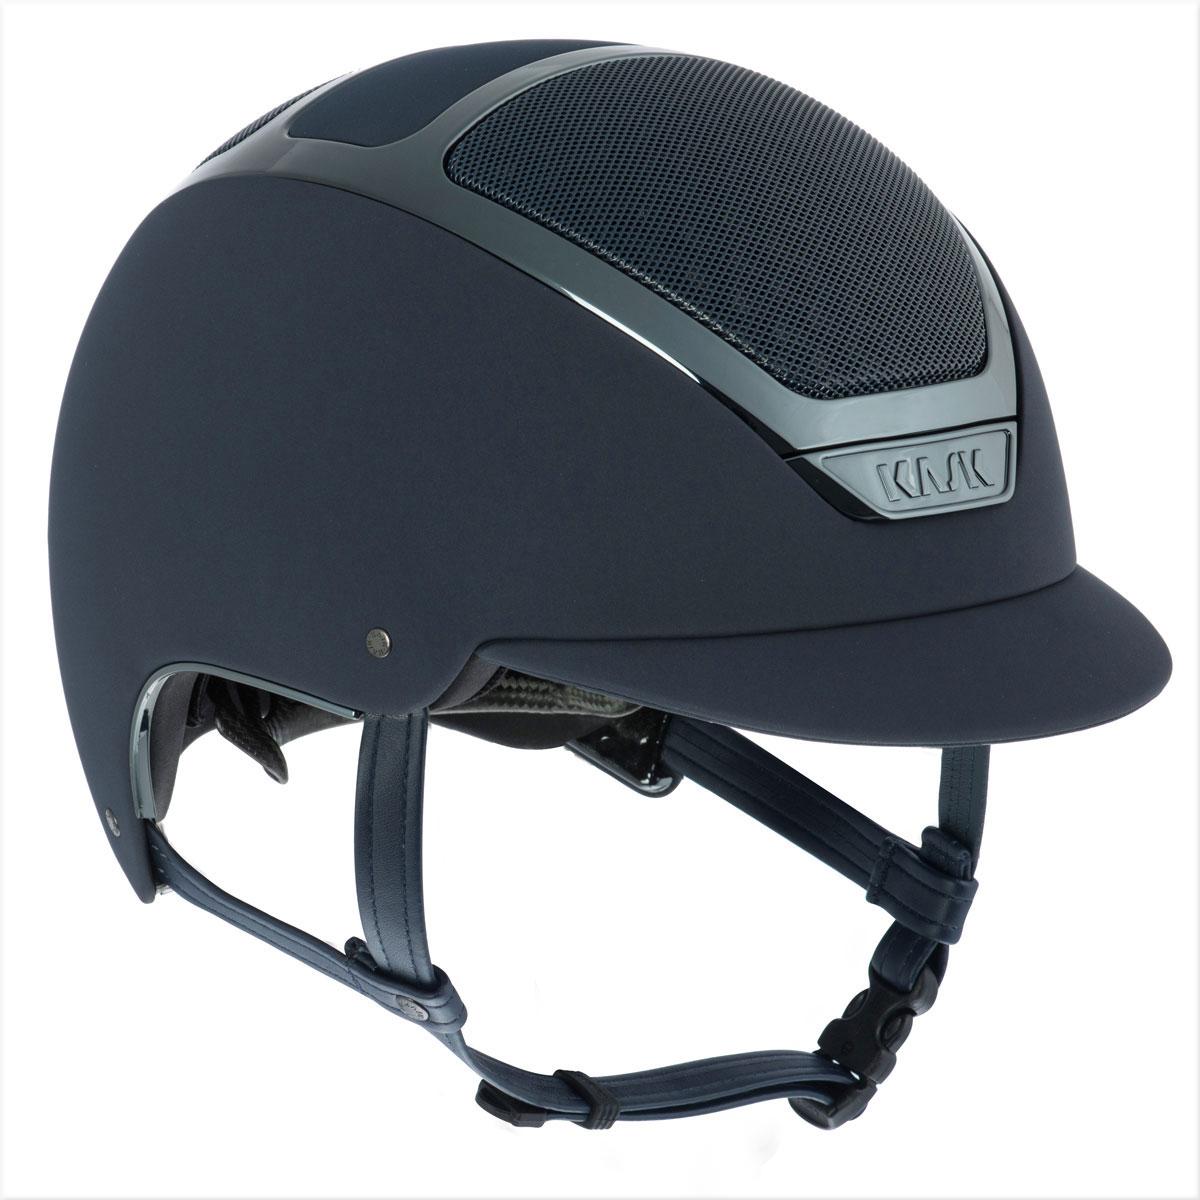 KASK Dogma Chrome Light Helmet - Sale!